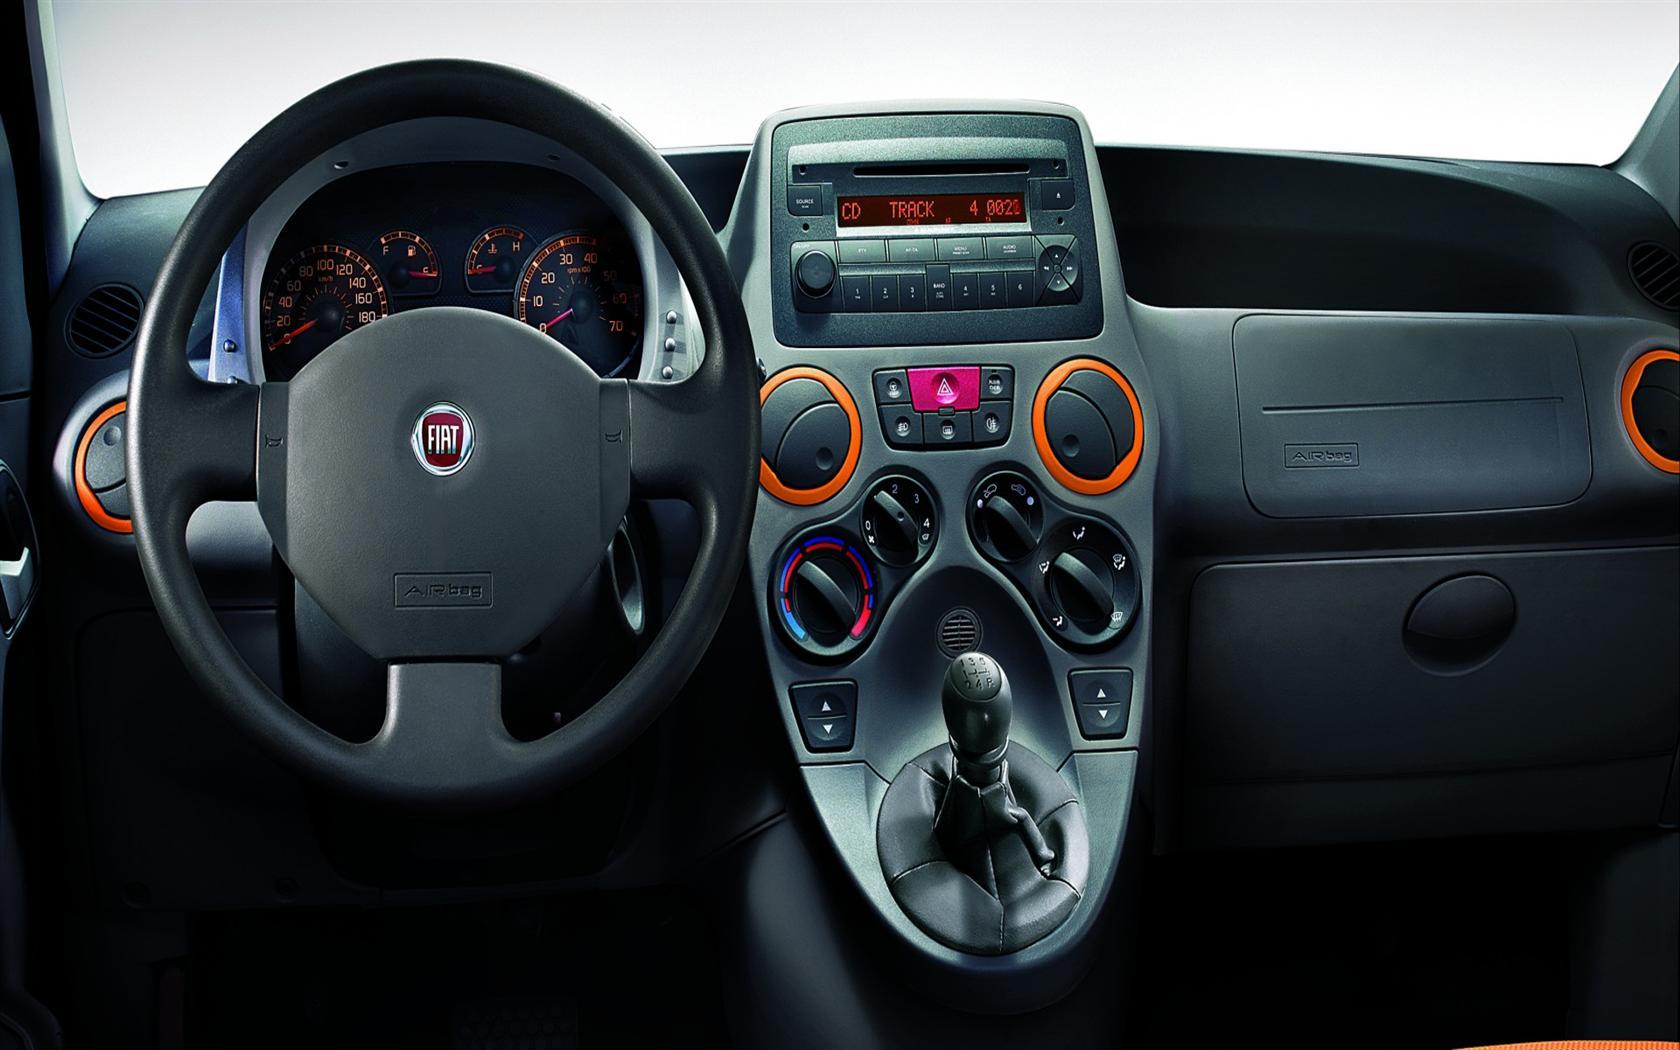 2009 Fiat Panda Image